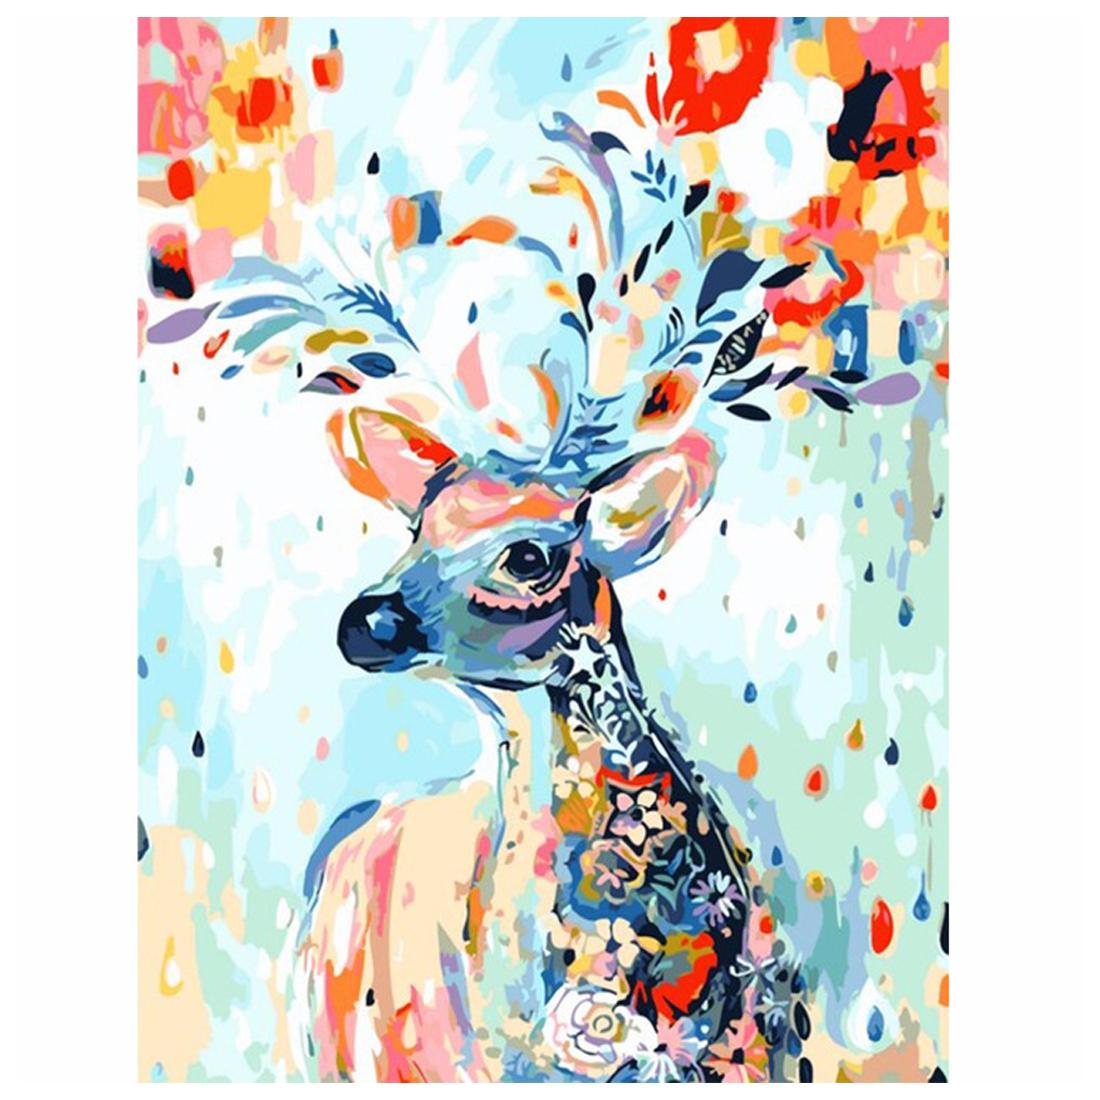 Grosshandel Diy Deer Tiere Leinwand Gemalde Mit Acrylfarben Pinsel